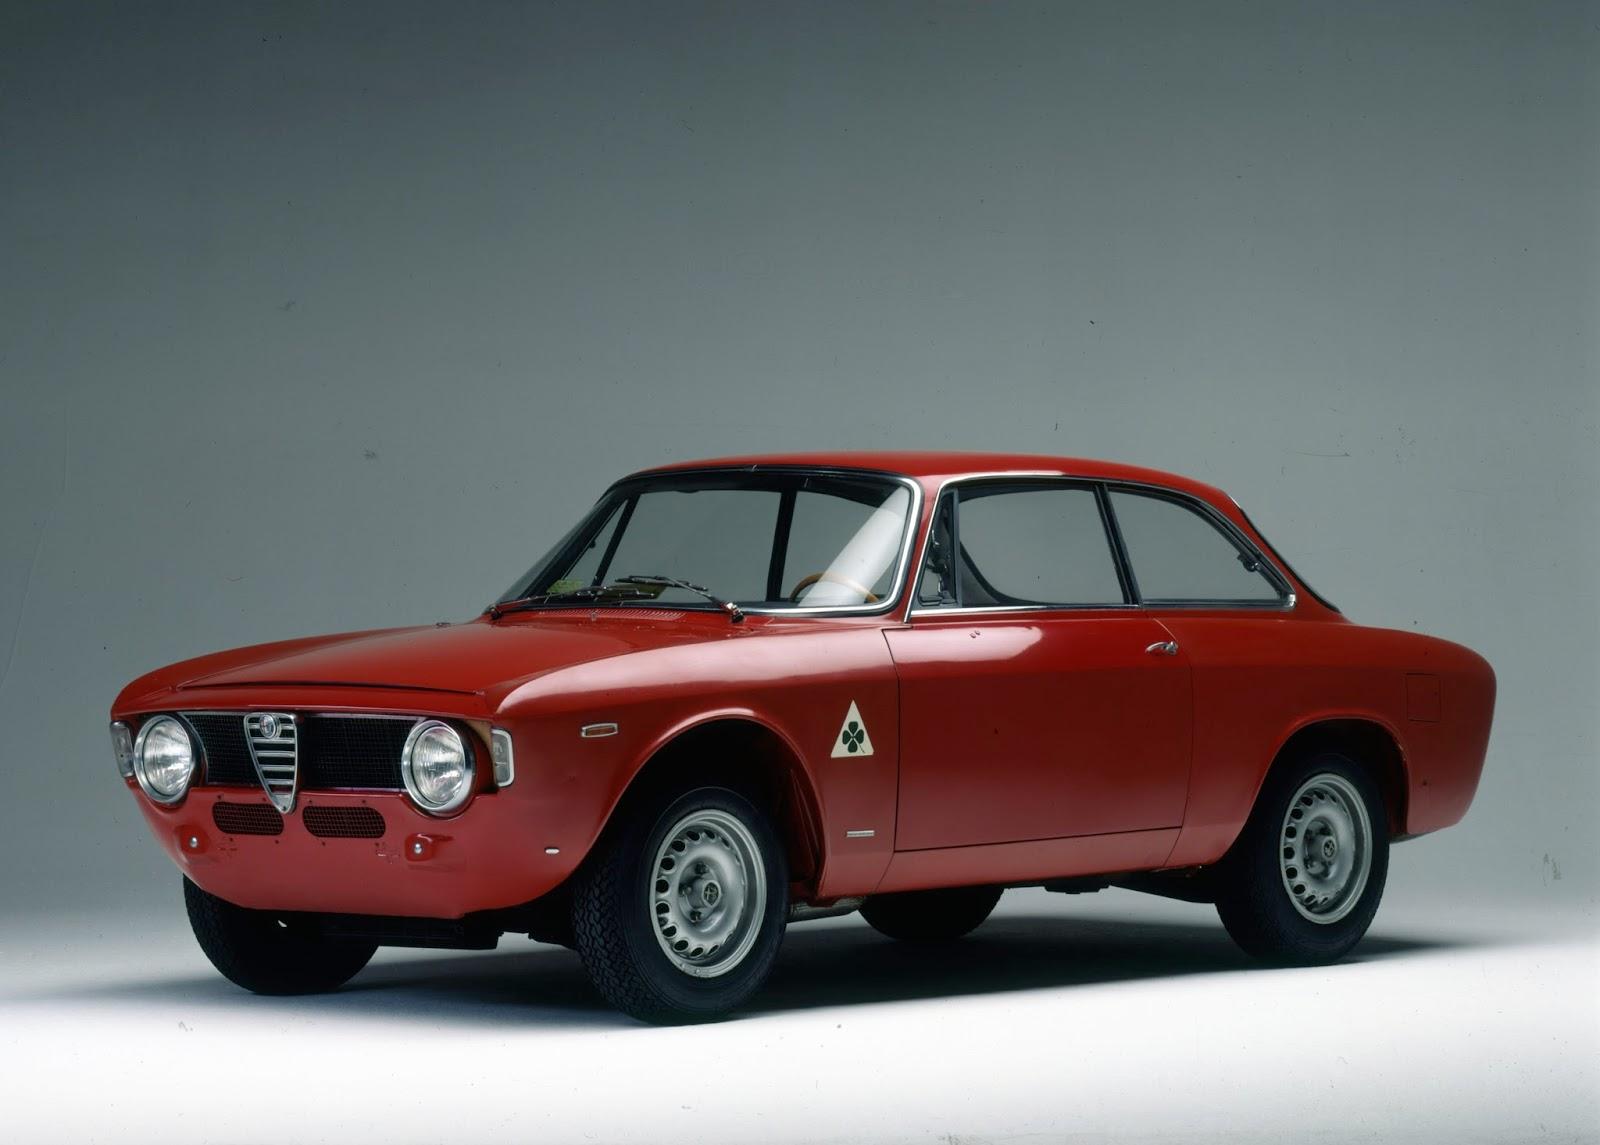 170413 Heritage Targa Florio 05 Τα ιστορικά μοντέλα της FCA επιστρέφουν στο Targa Florio Abarth, alfa romeo, Classic, Fiat, Lancia